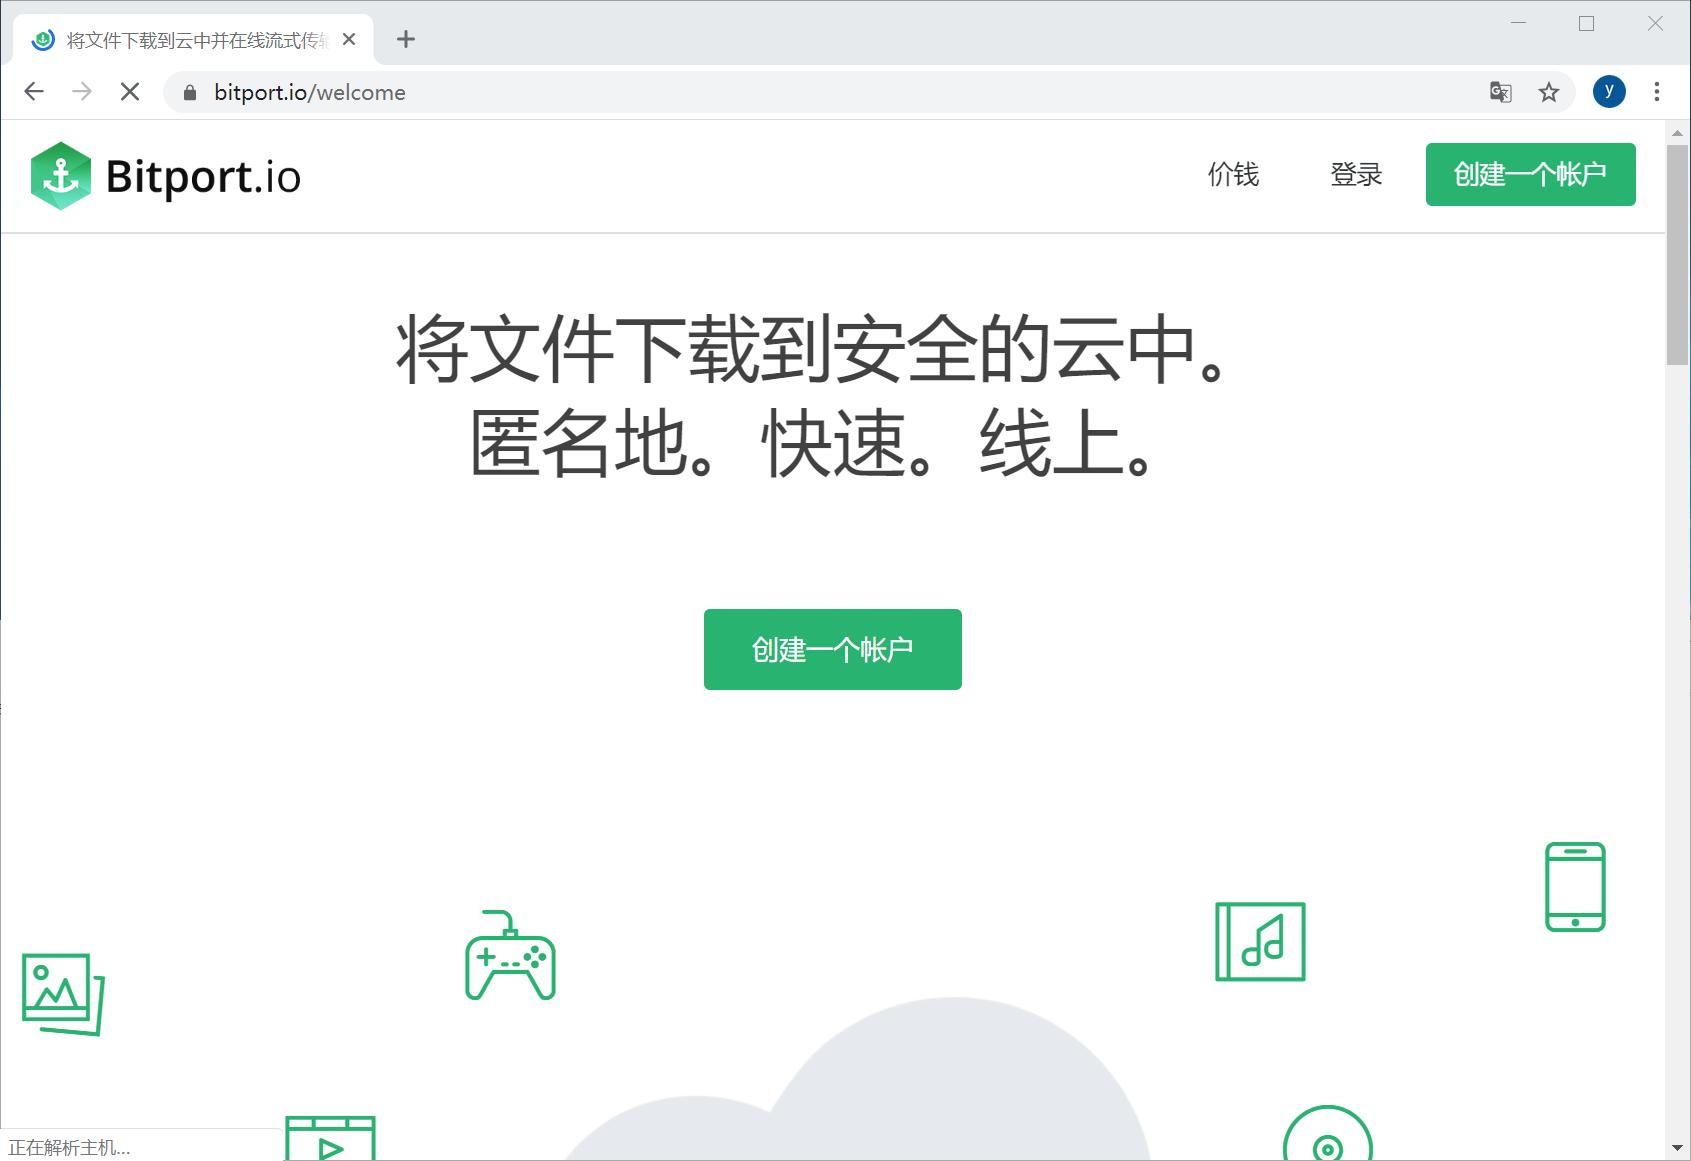 Bitport.io 云下载